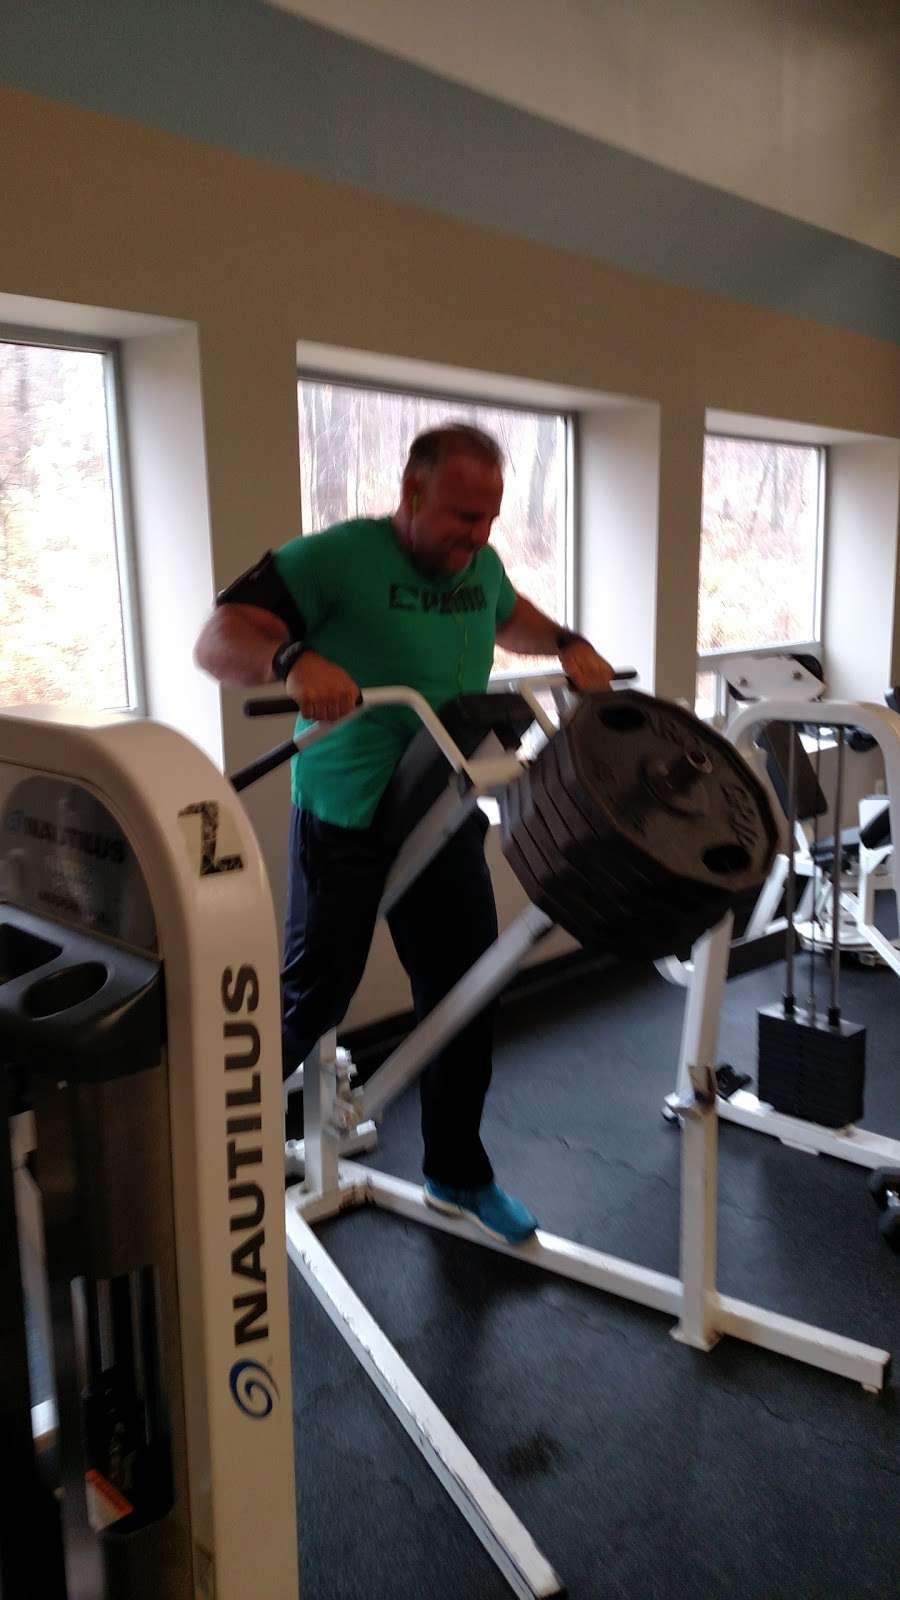 Sparta Athletic Club - gym    Photo 4 of 5   Address: 115 S Sparta Ave, Sparta Township, NJ 07871, USA   Phone: (973) 729-9141